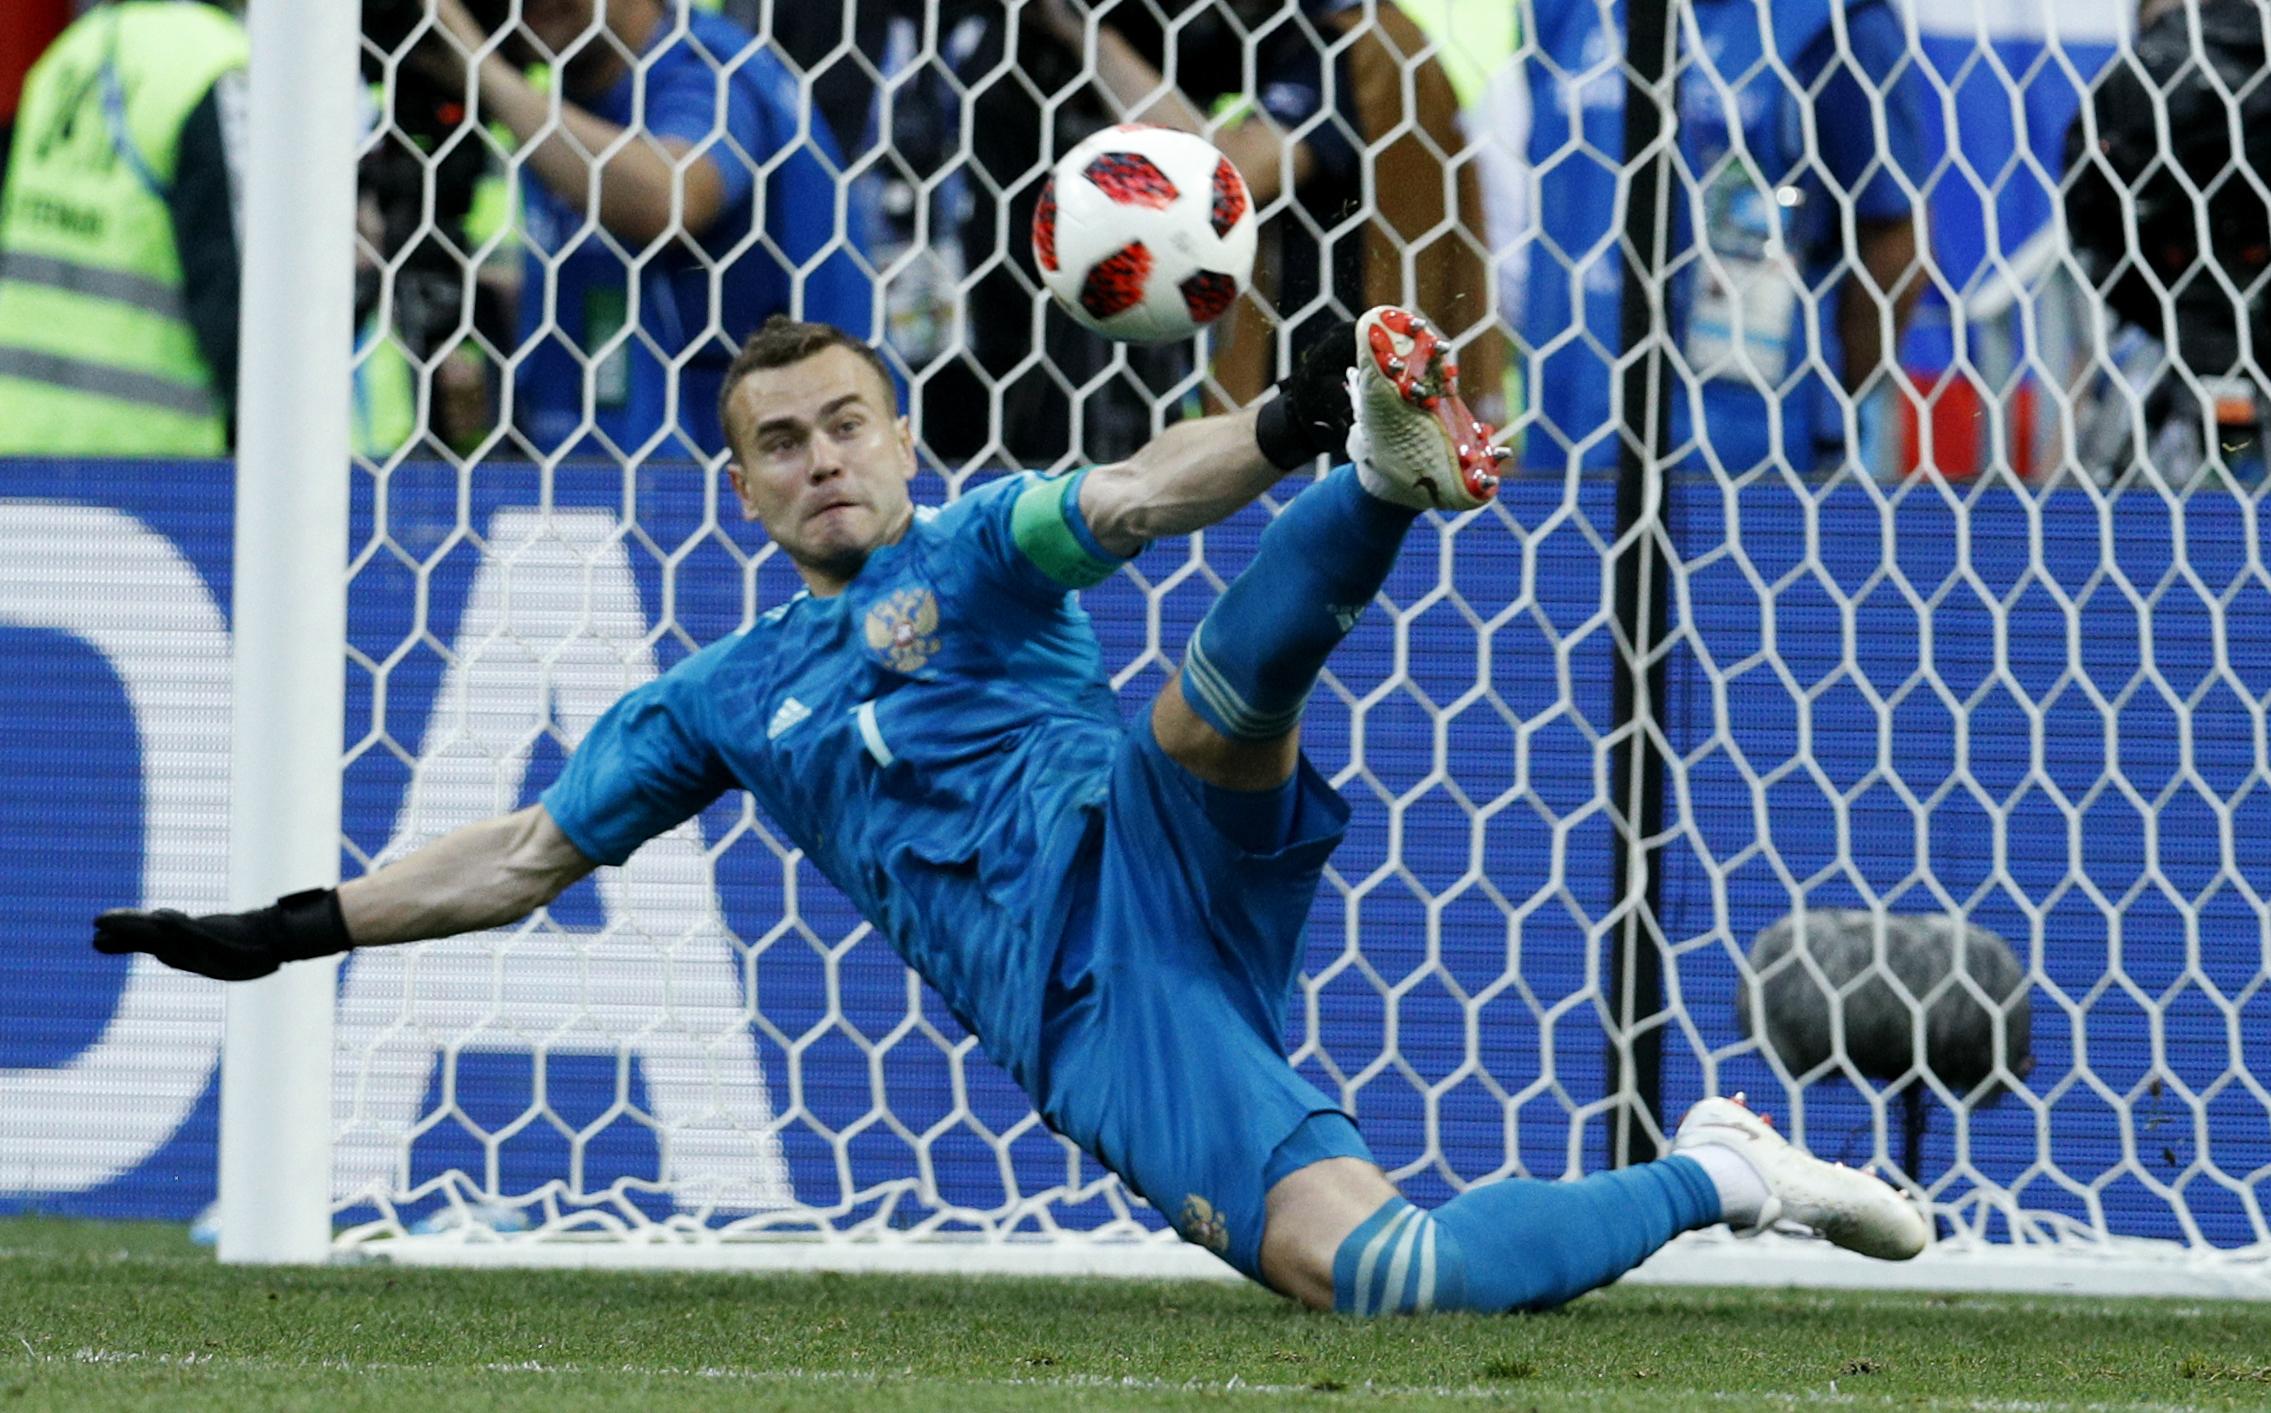 Russia goalkeeper Akinfeev ends 15-year national team duty